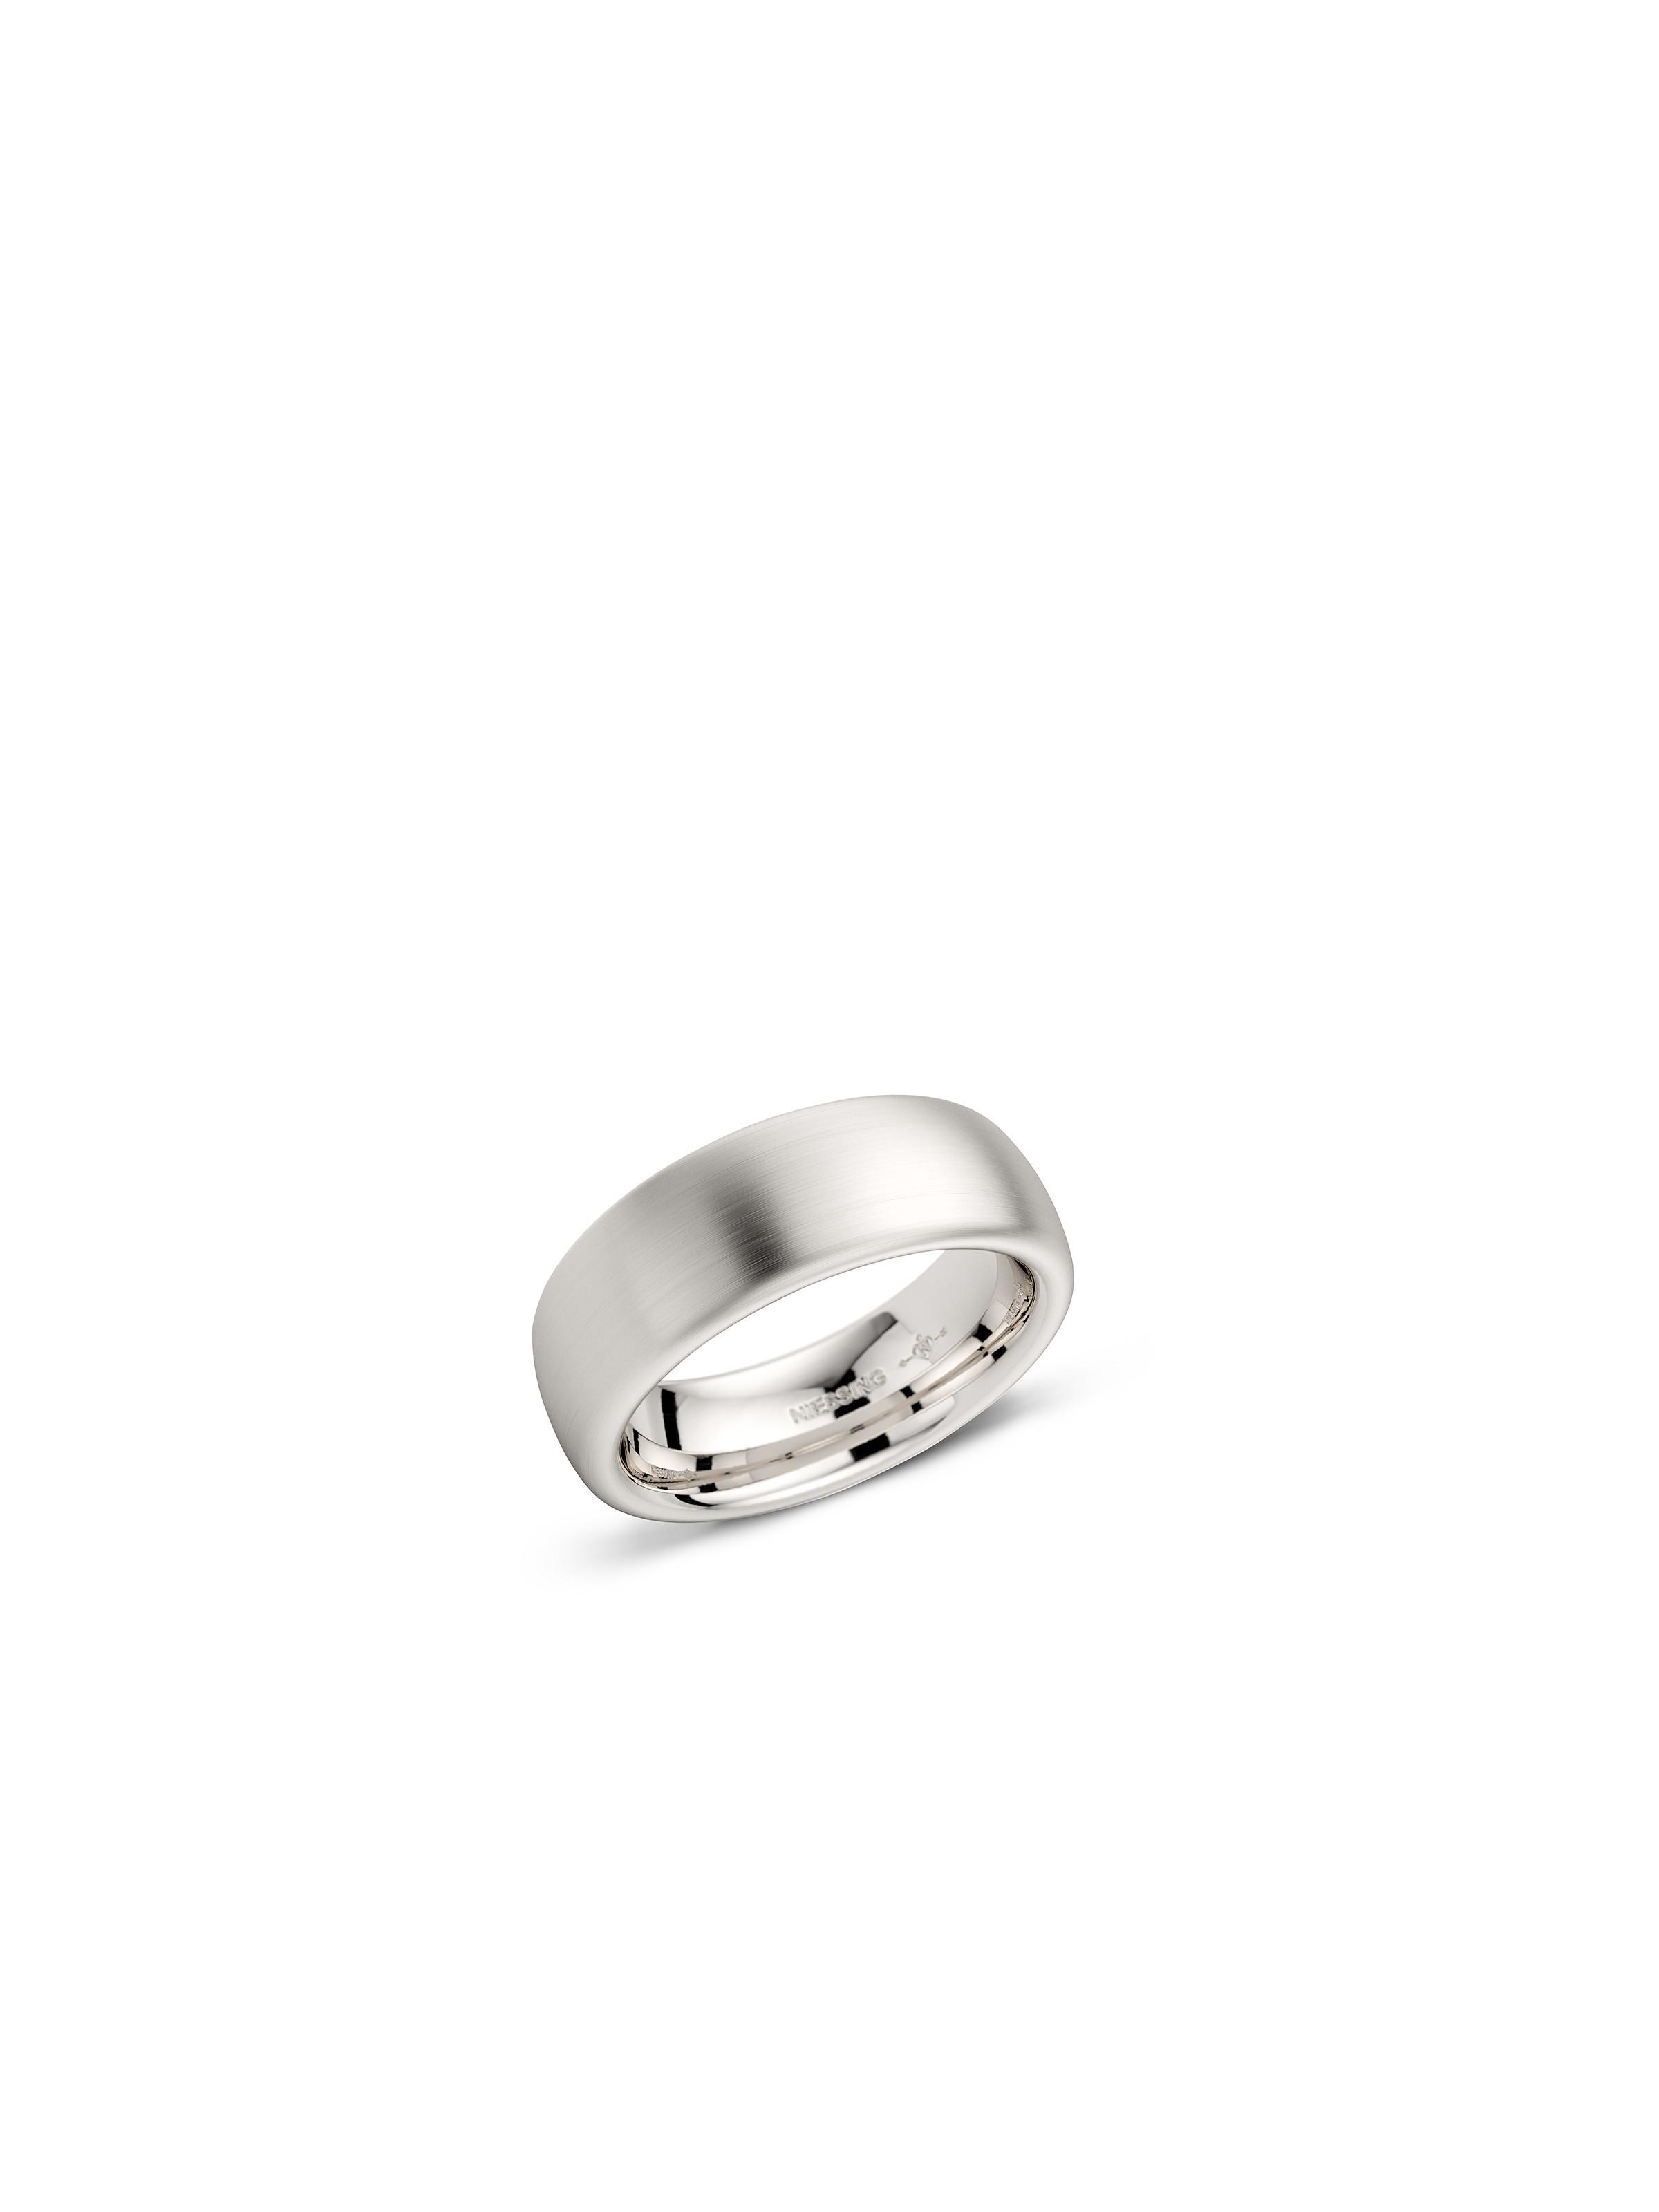 Oval wedding ring with a silk-matt surface